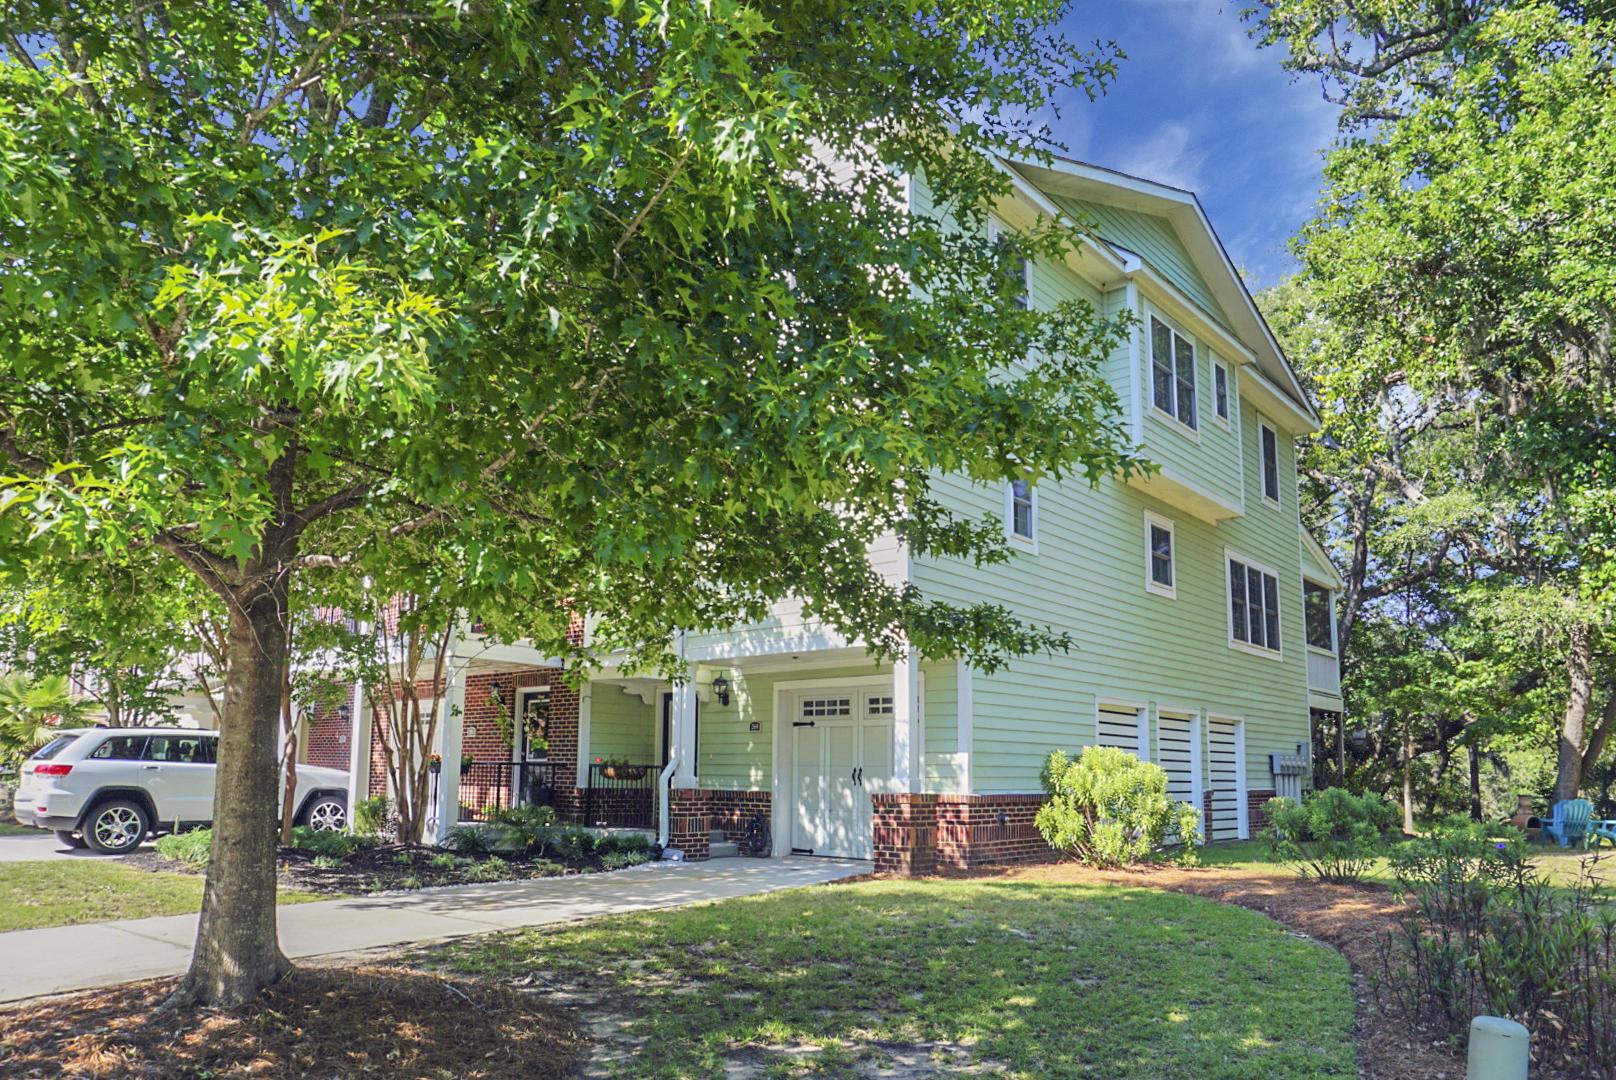 Etiwan Pointe Homes For Sale - 269 Etiwan Pointe, Mount Pleasant, SC - 1